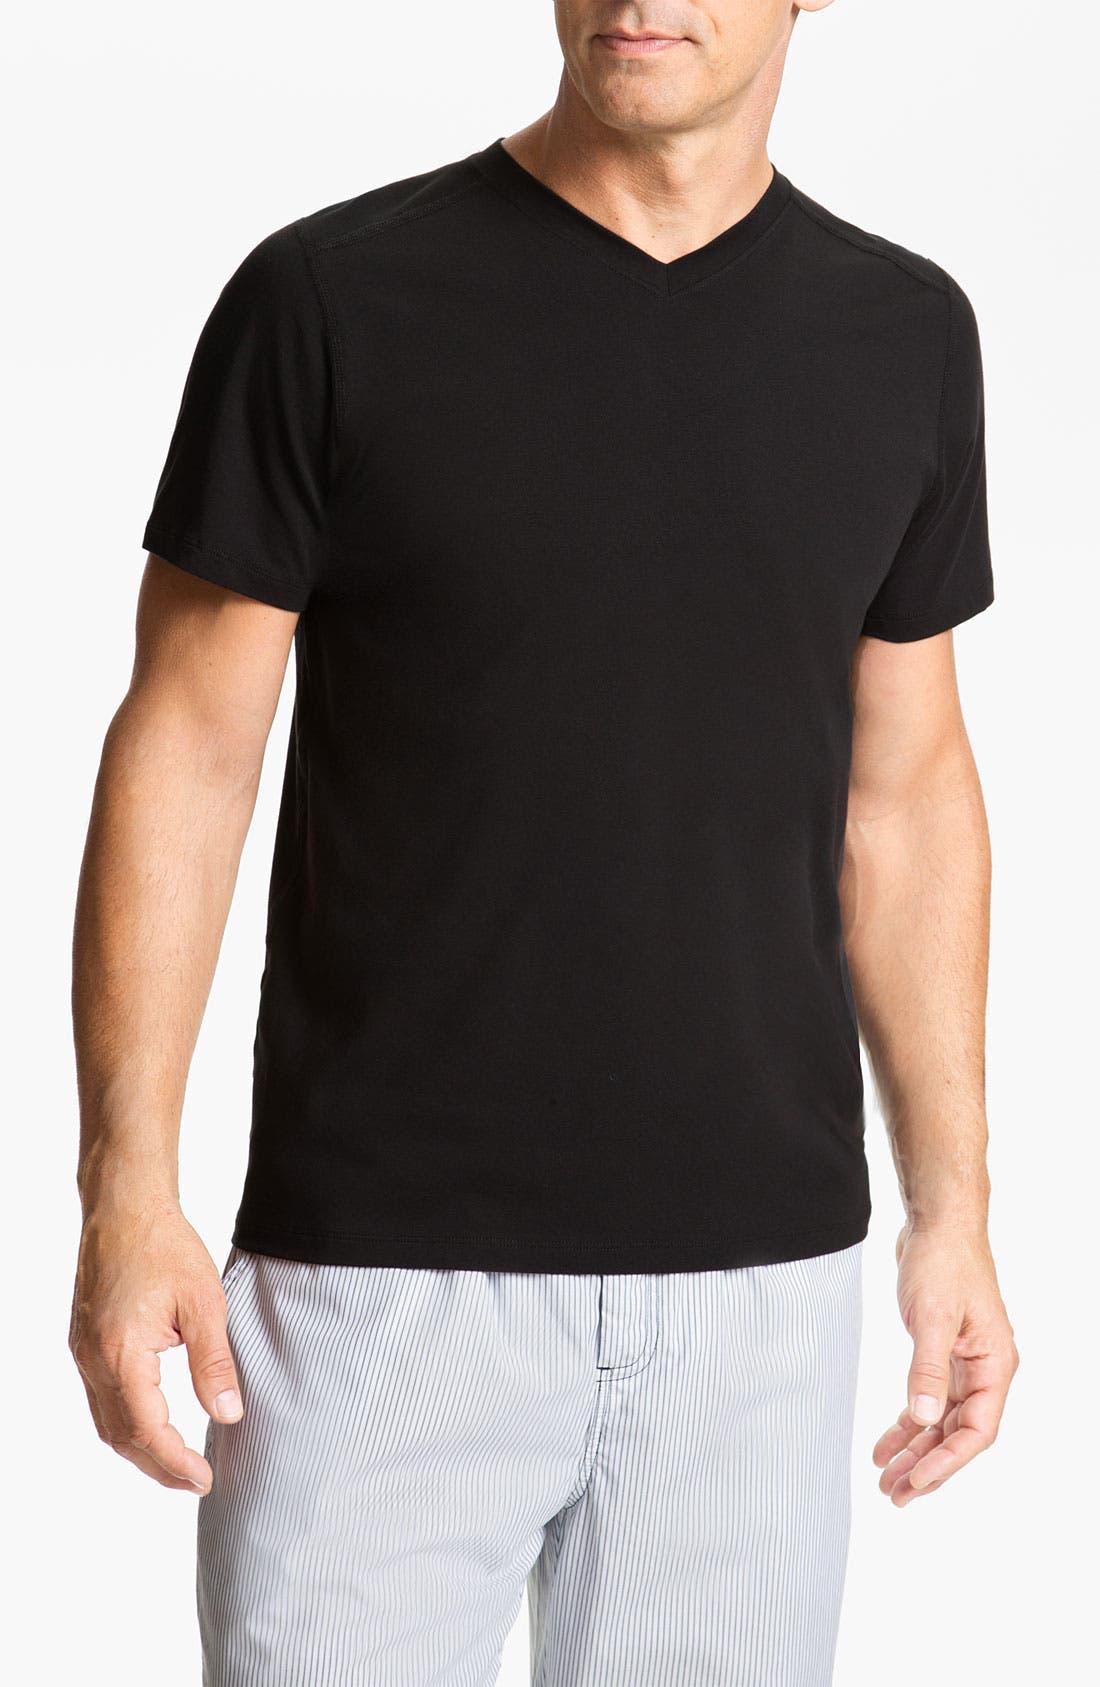 Main Image - Daniel Buchler V-Neck T-Shirt